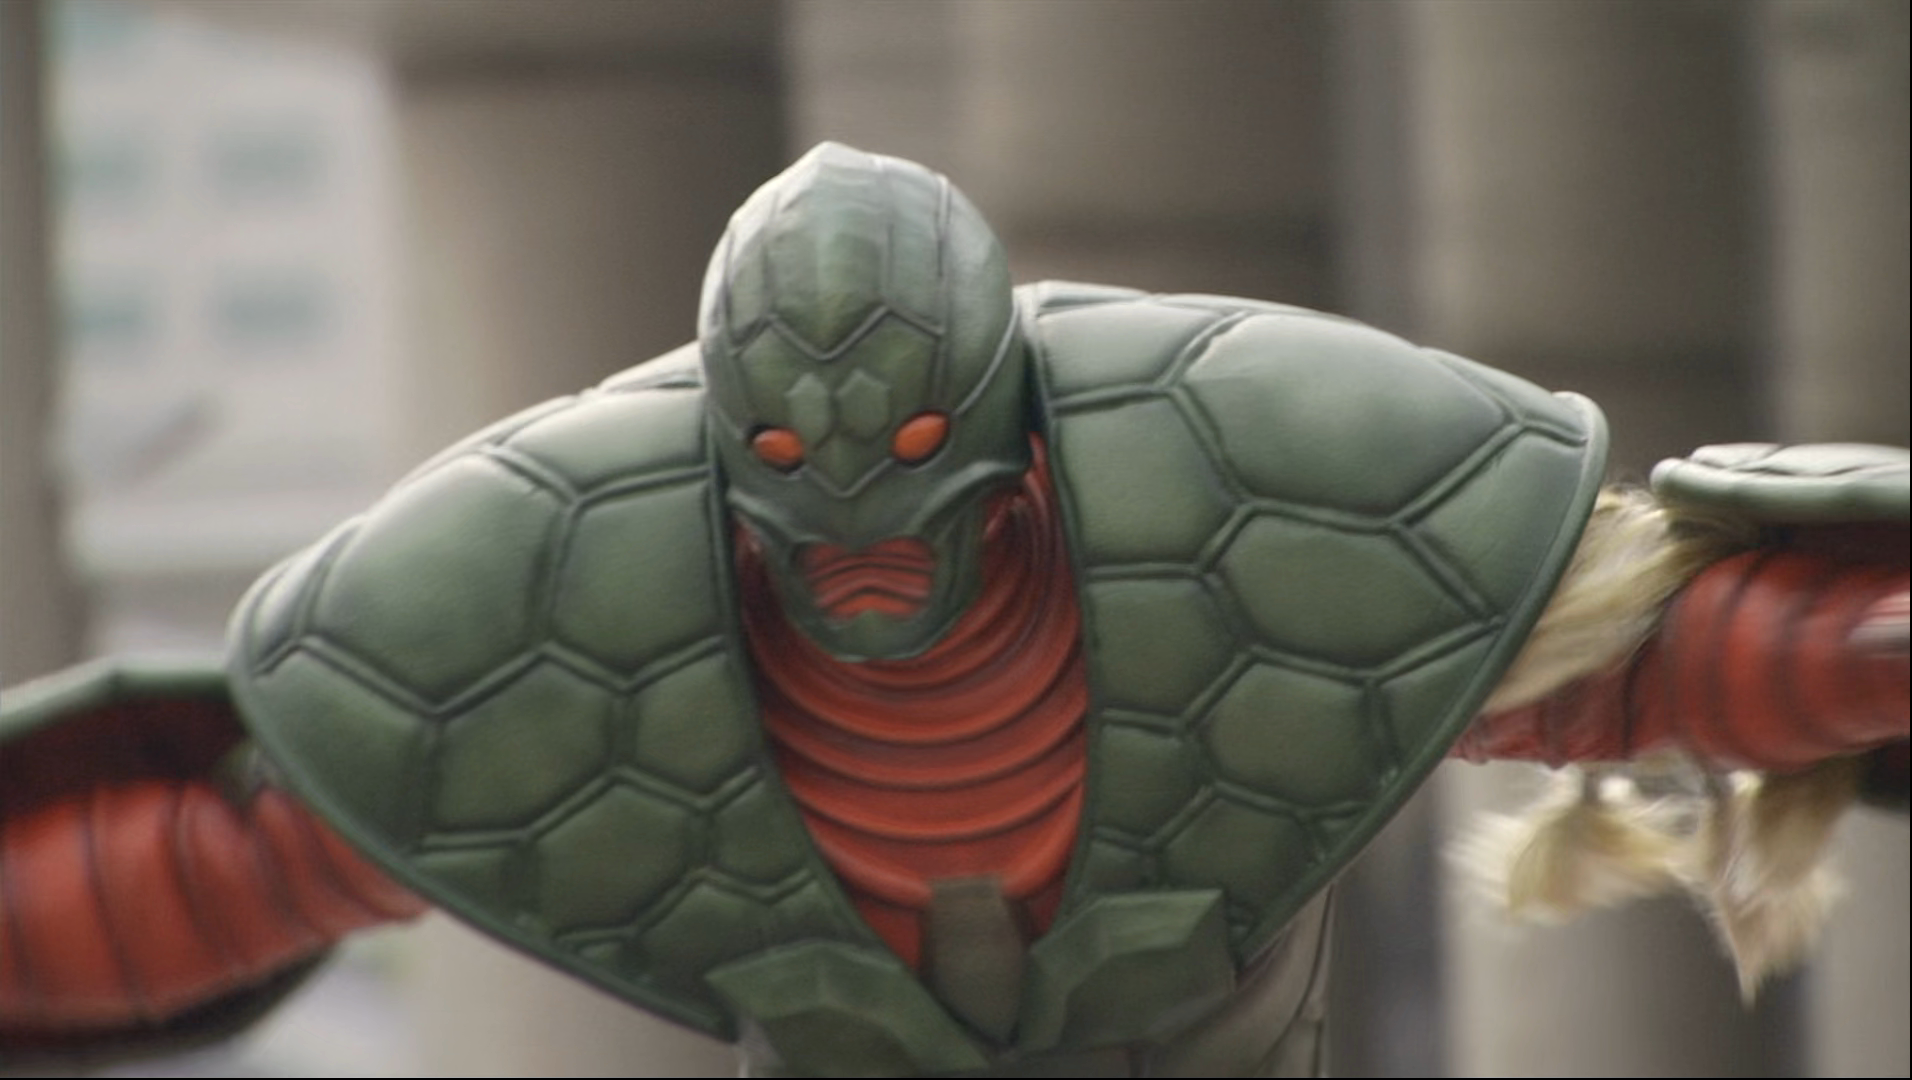 Tortoise Imagin